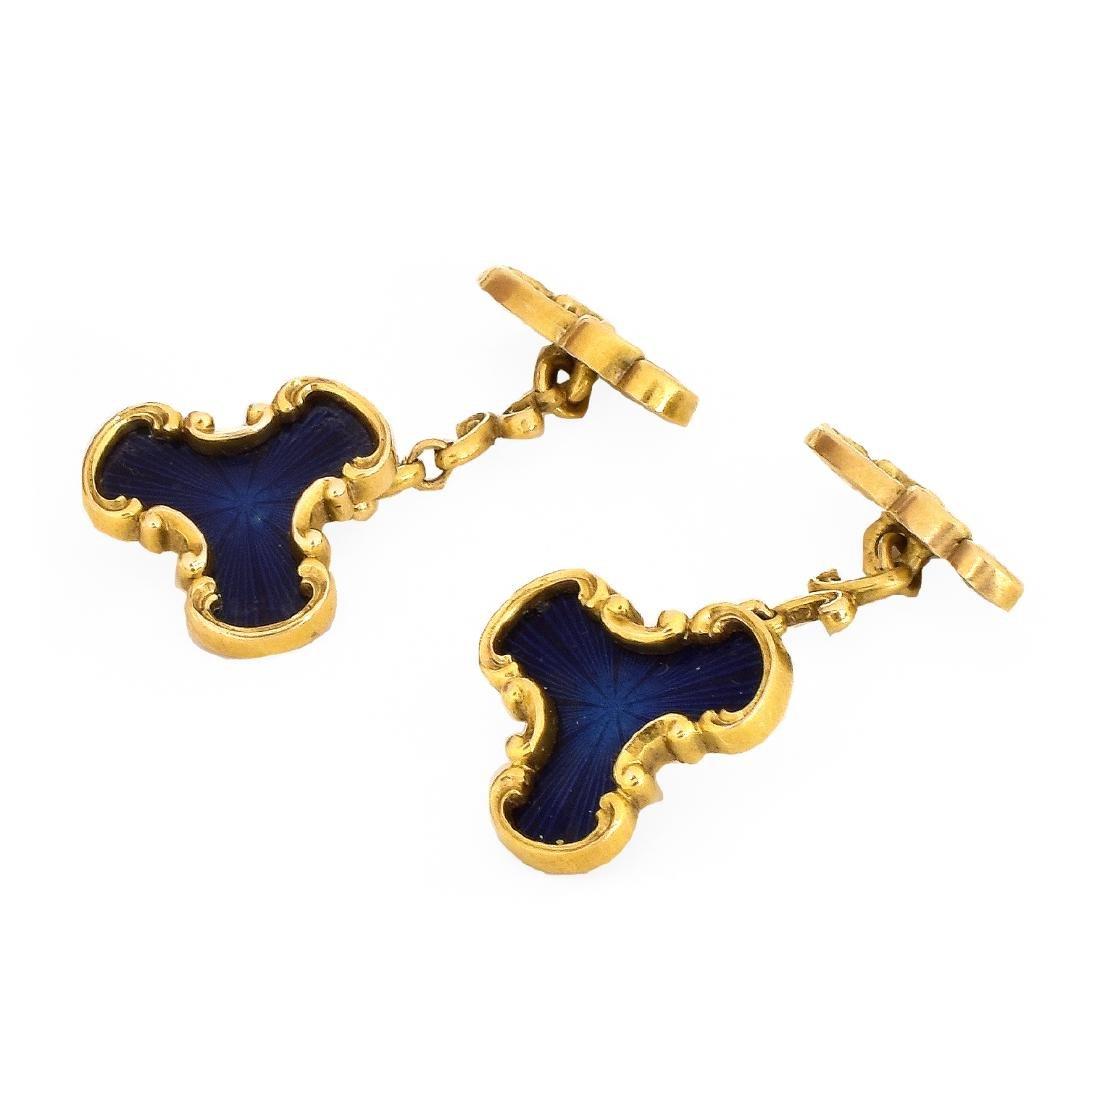 Russian Faberge Cufflinks